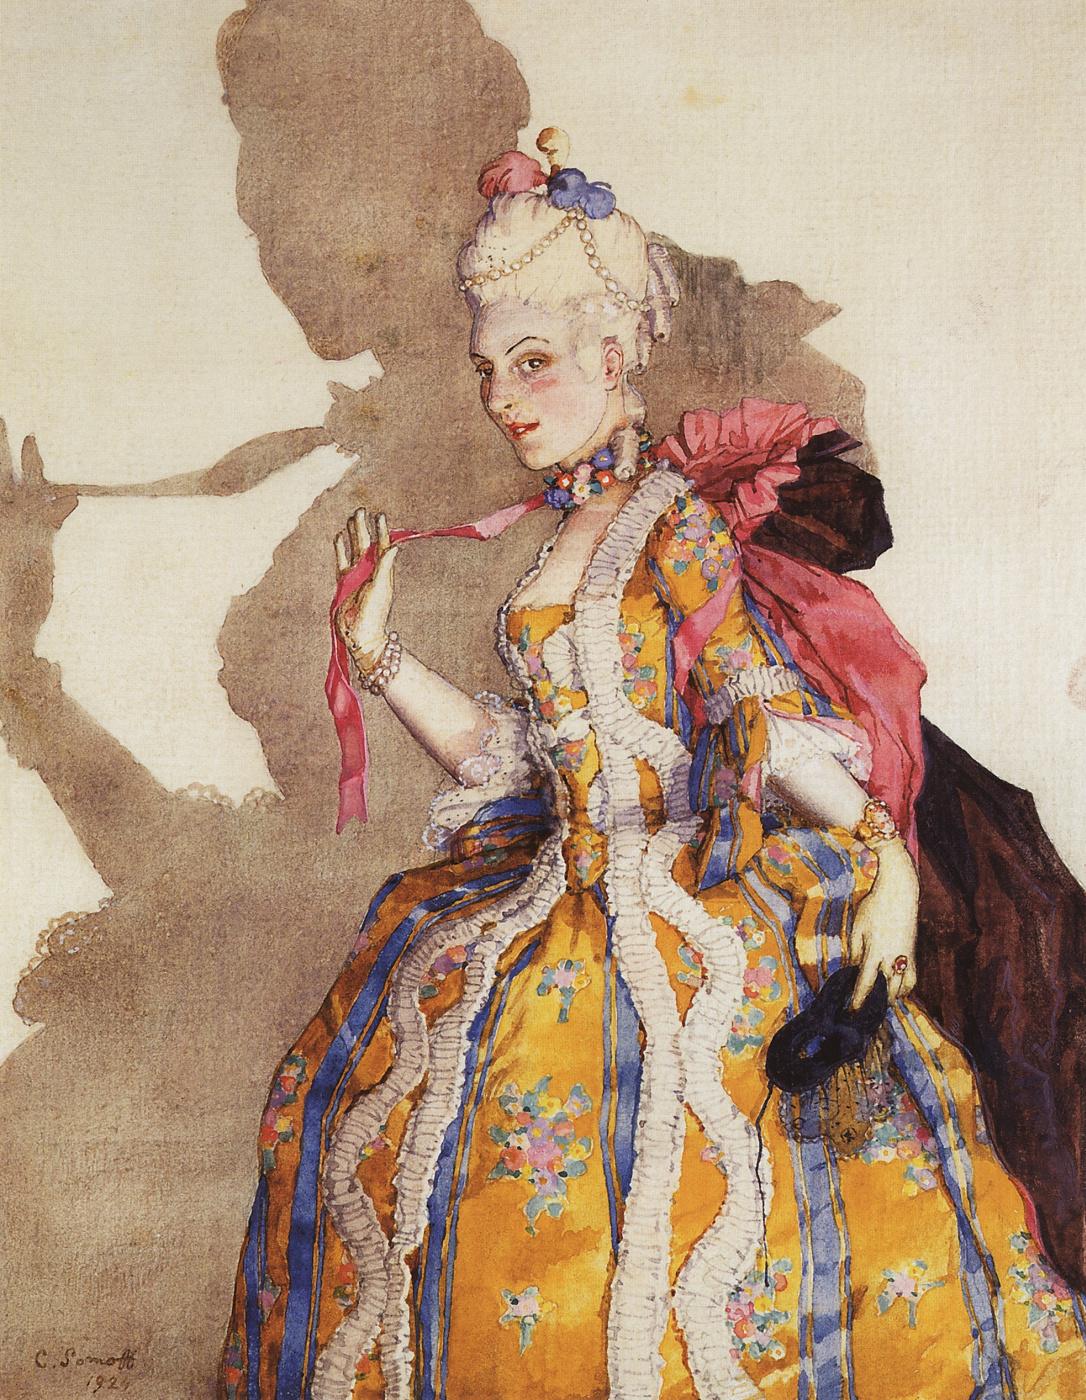 Konstantin Somov. Costume design awnings for T. P. Karsavina (a dance to the music of Mozart)